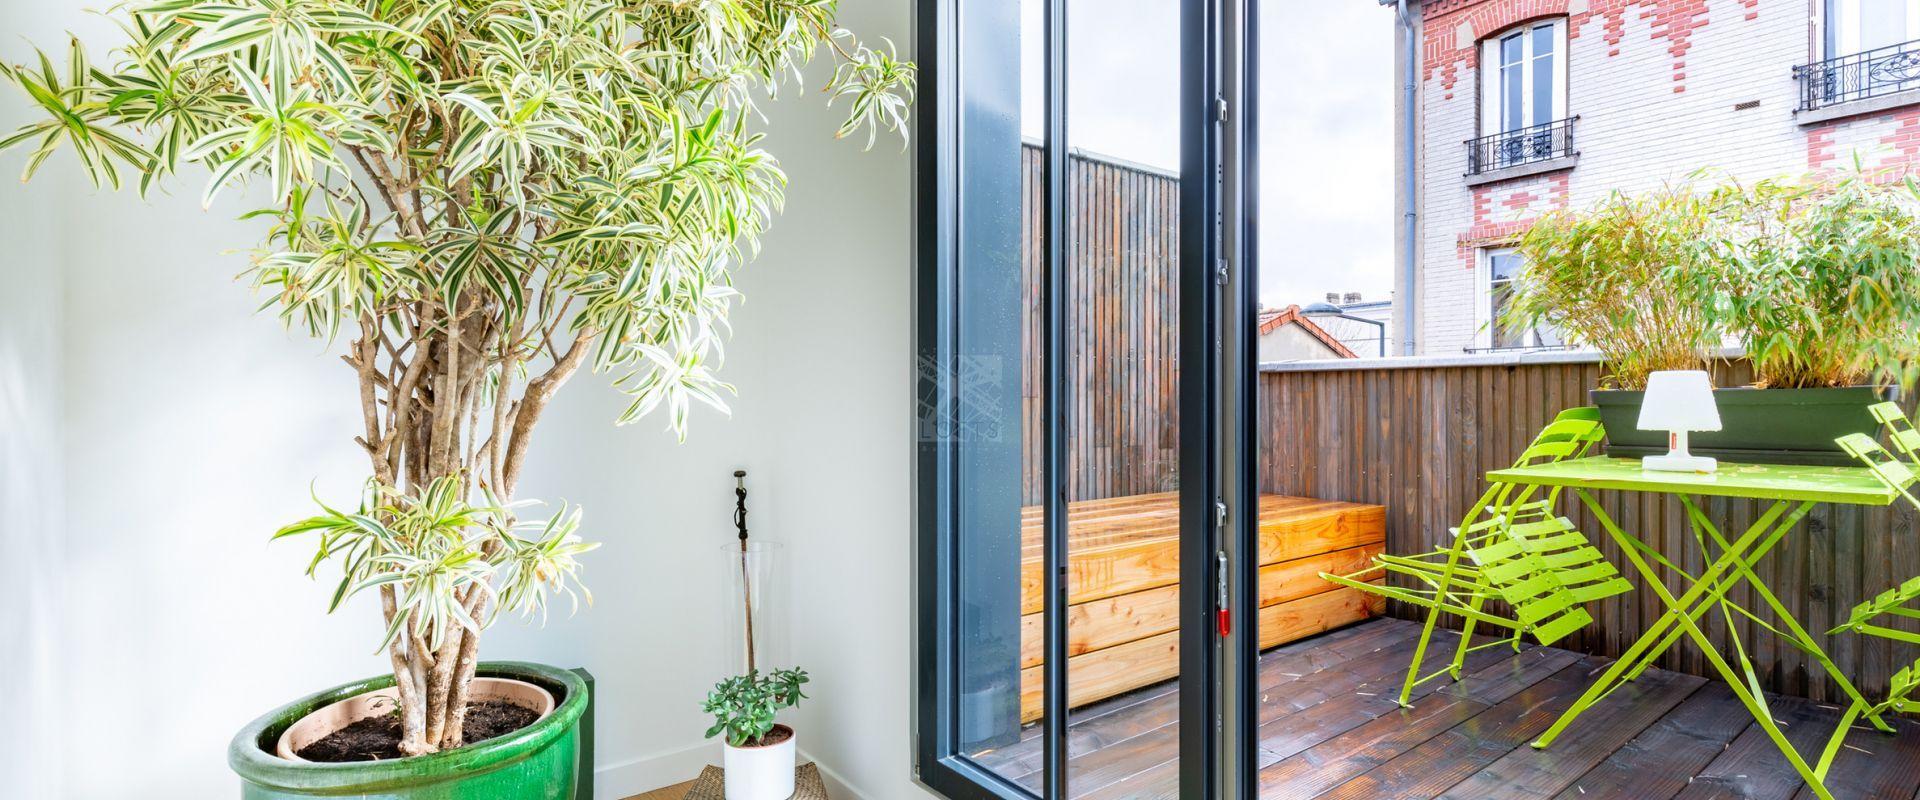 Ateliers Lofts Associes Agence Immobiliere A Paris